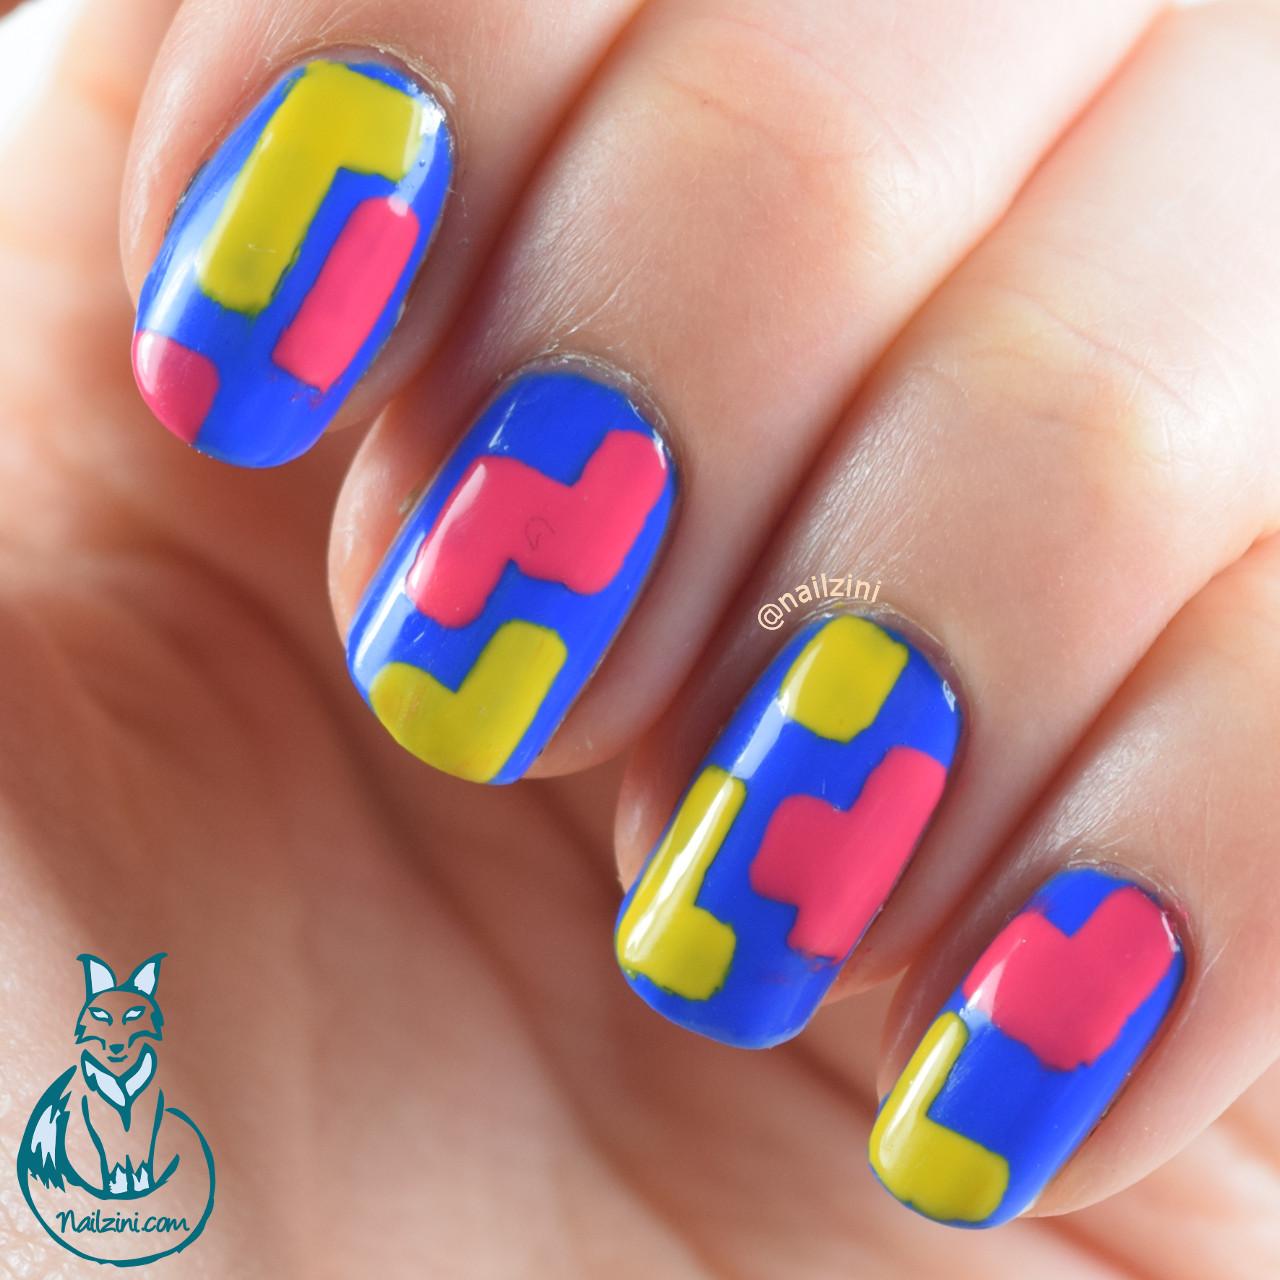 NAFW - Fashion Trend - Color Blocking